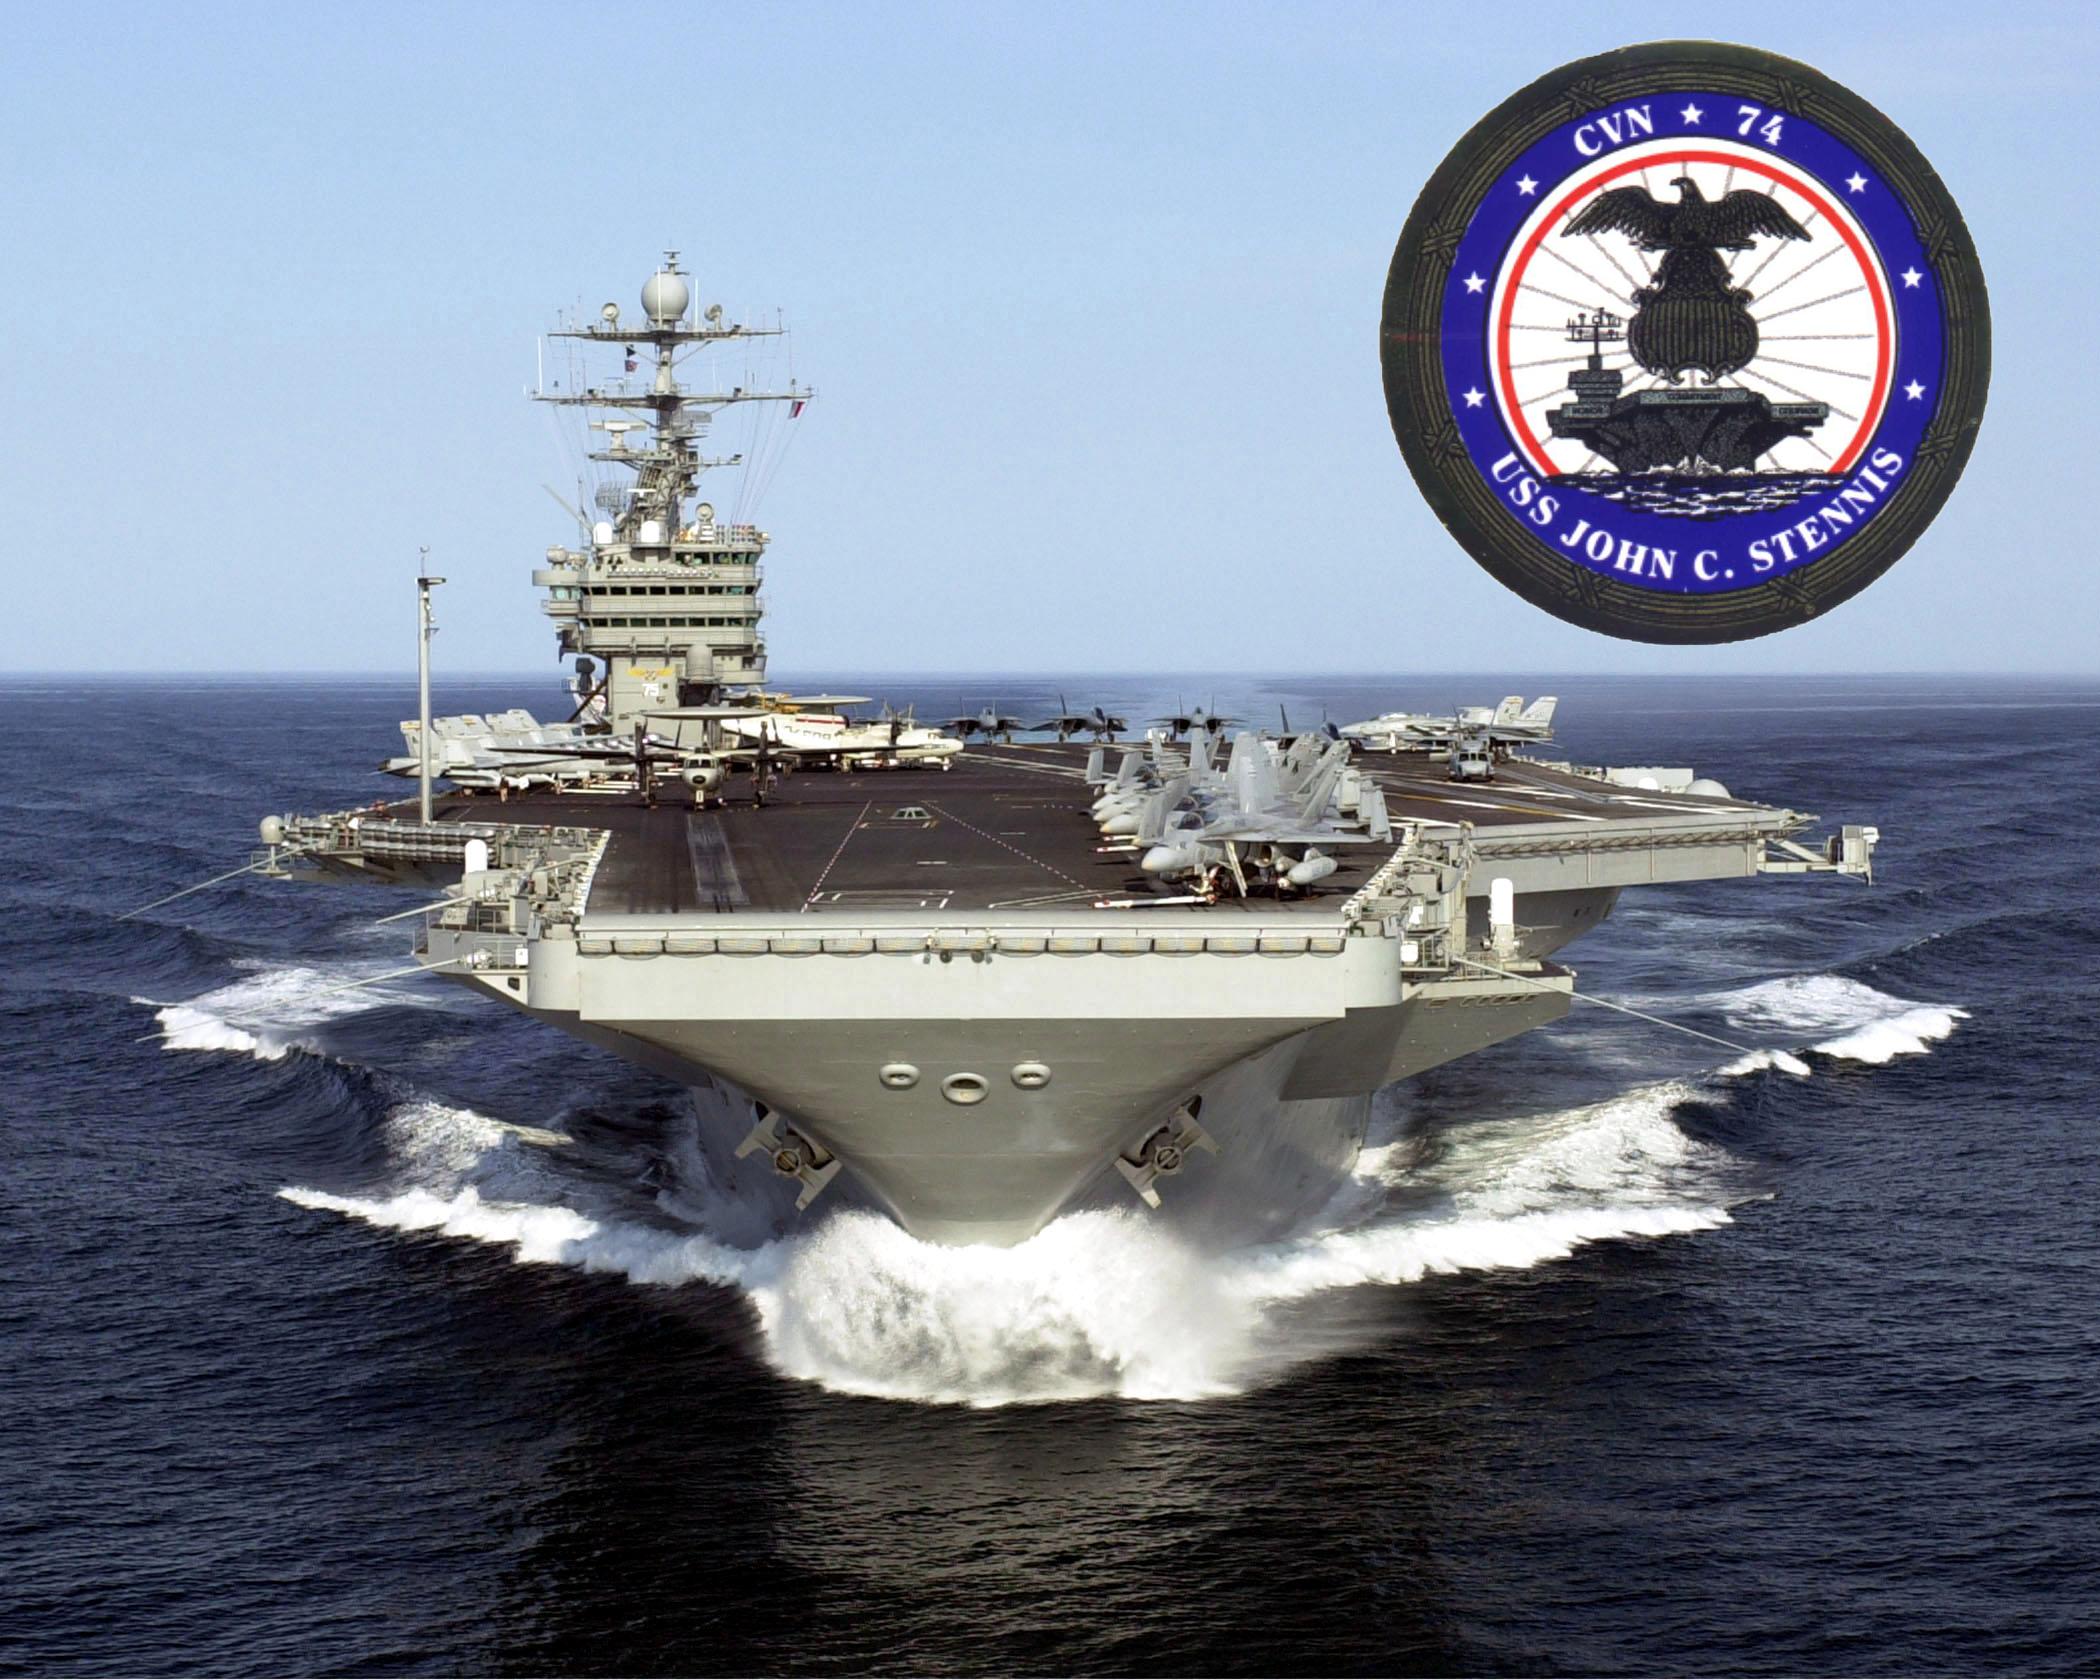 USS JOHN C. STENNIS CVN-74 Bild: U.S. Navy